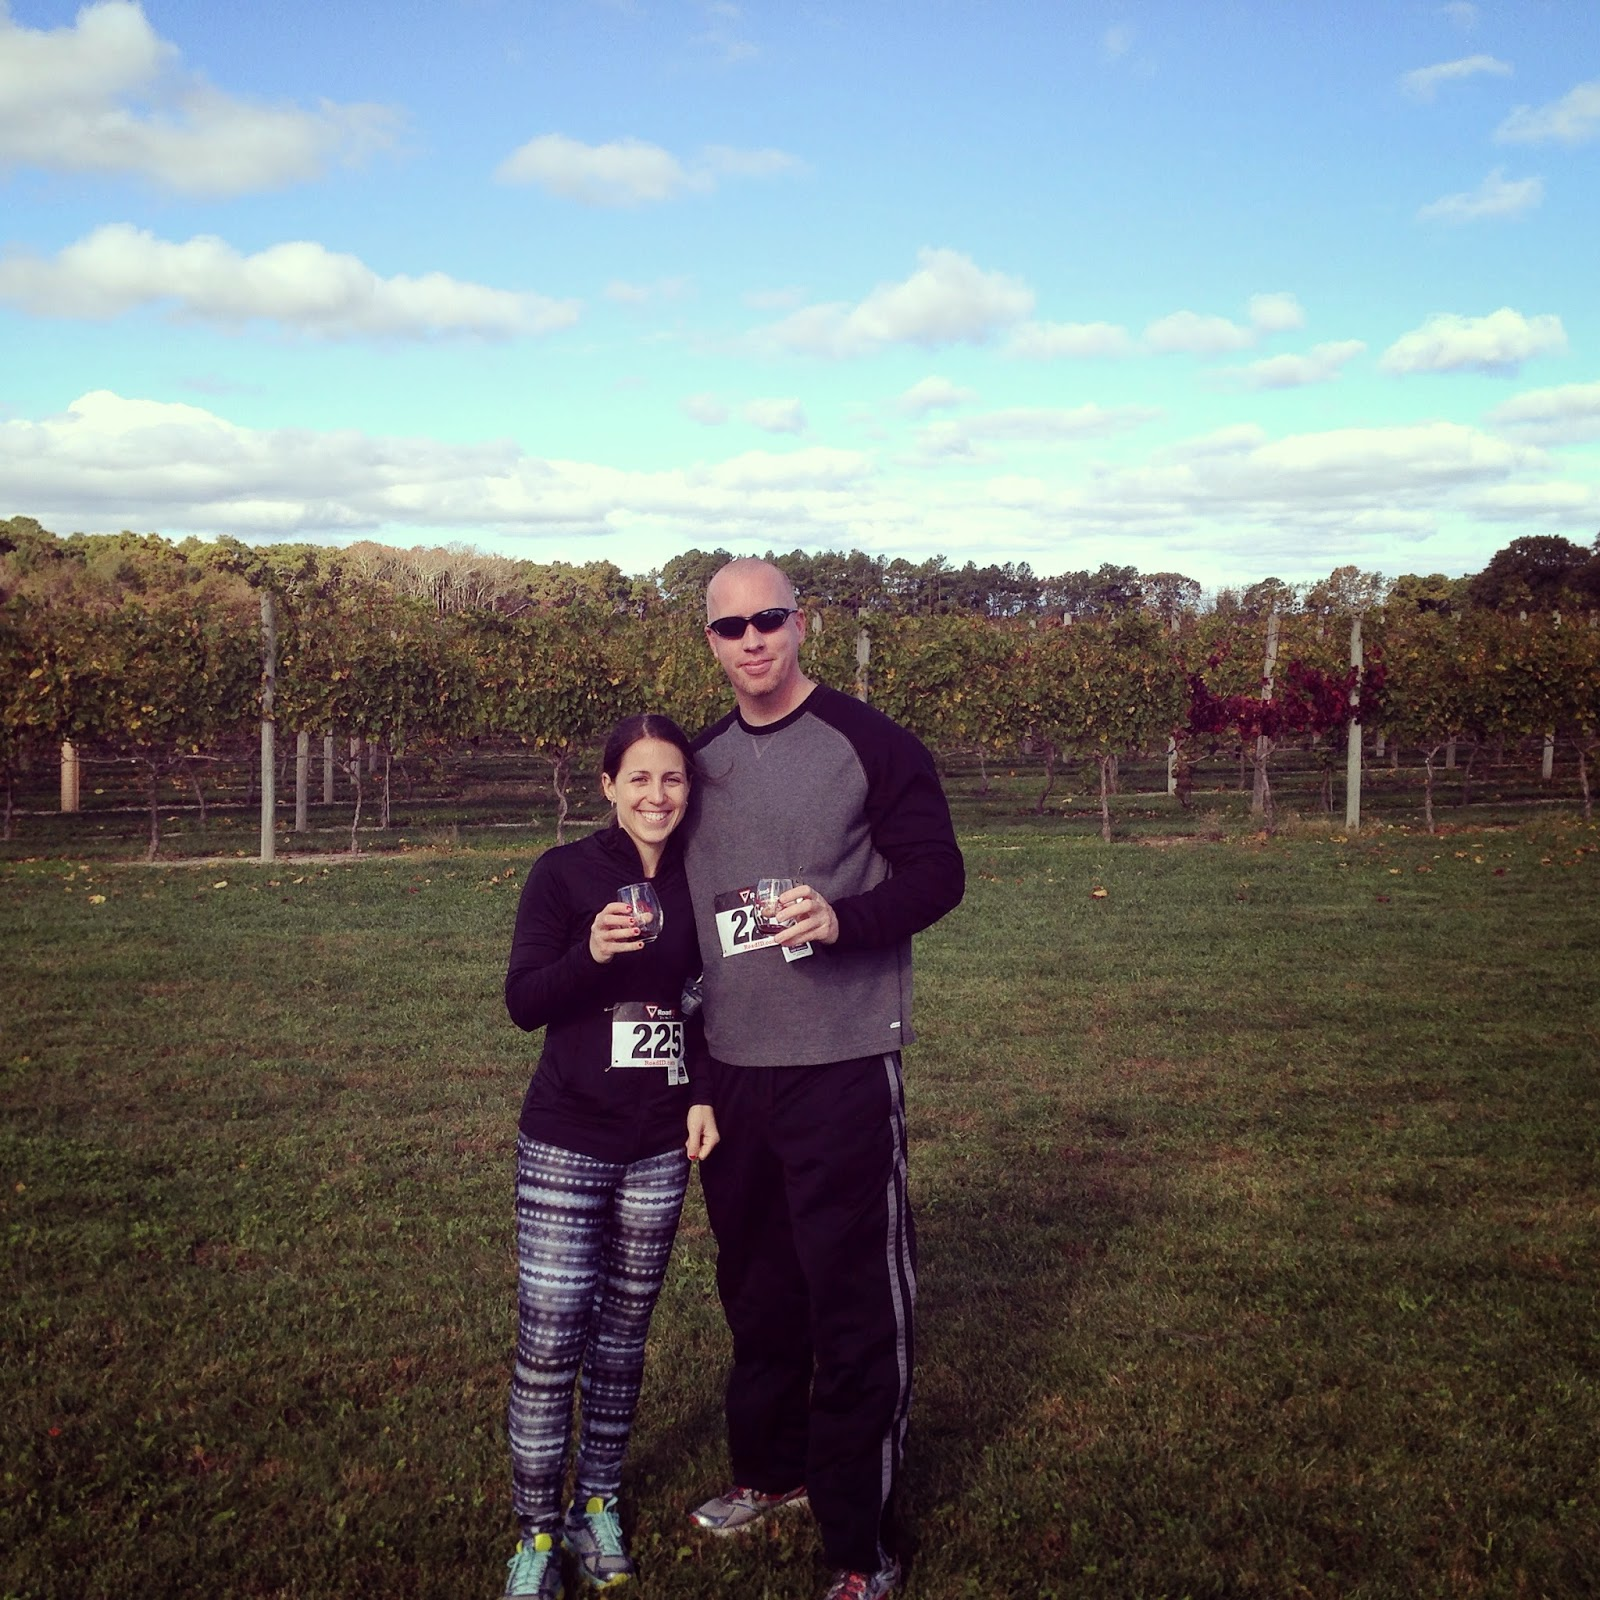 cape may wine trail - Hawk Haven Winery